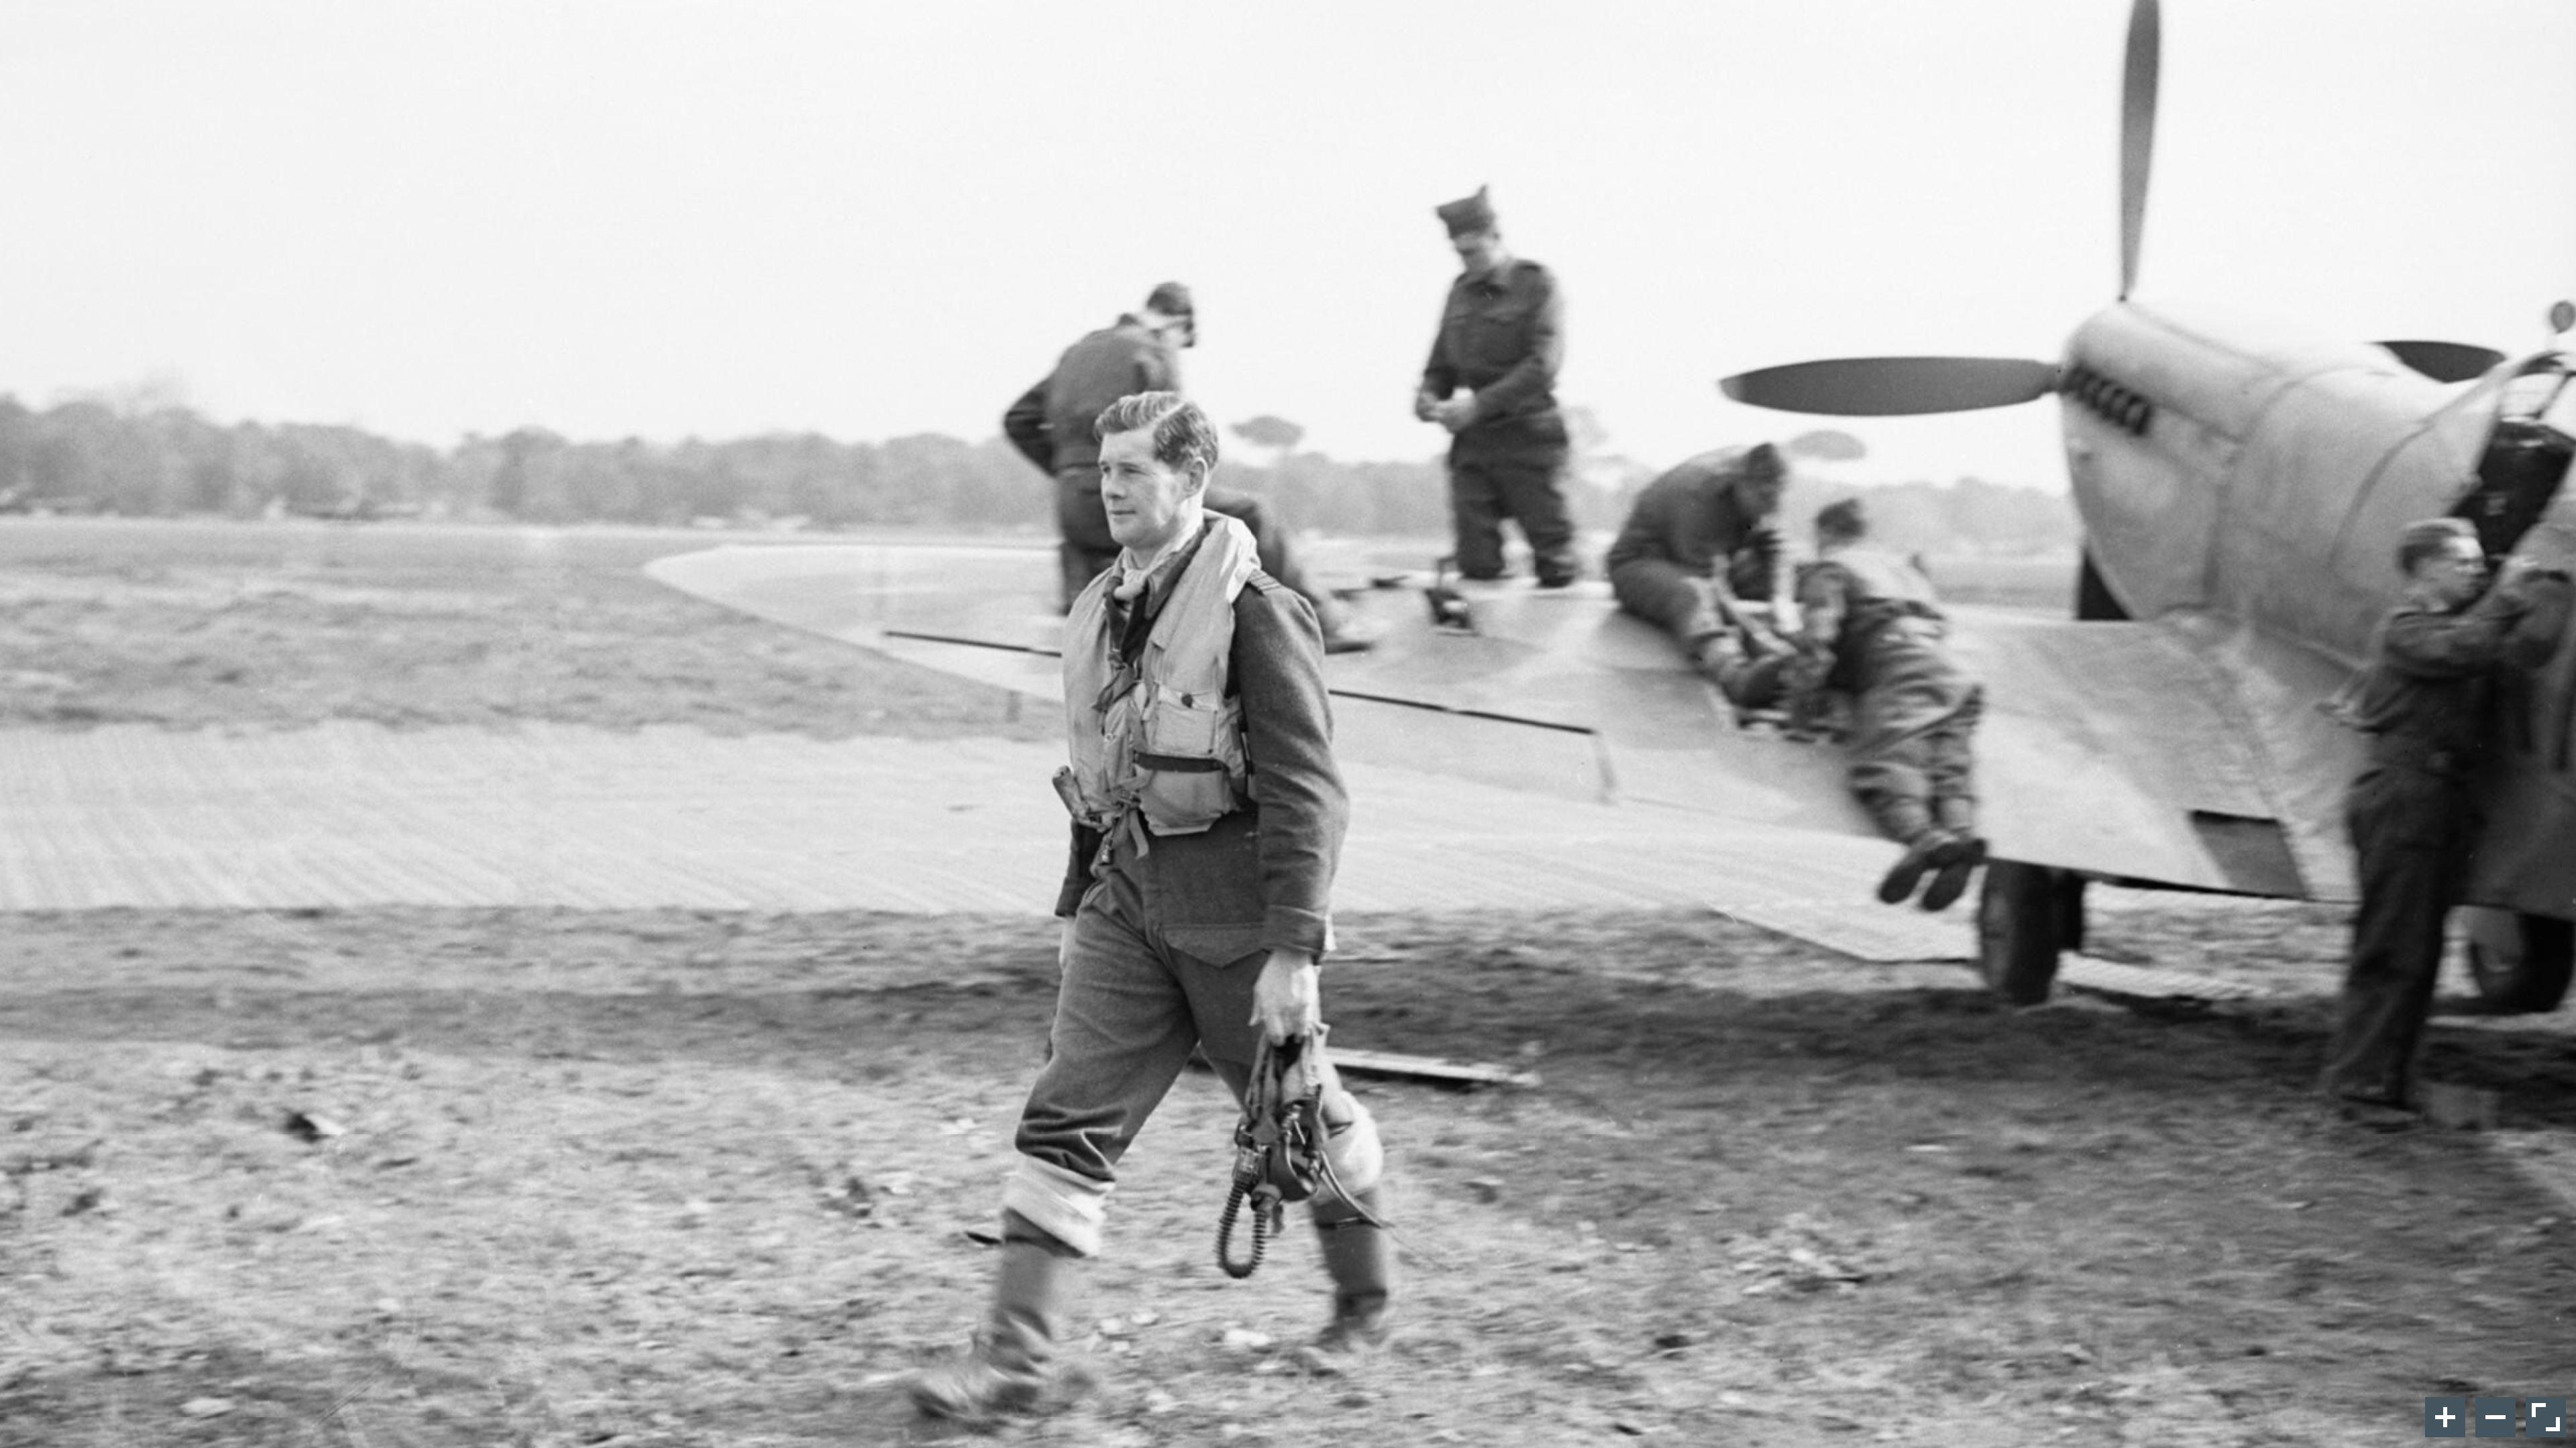 Aircrew RAF 72Sqn Flt Lt GJ Cox at Lago landing ground near Castel Volturno IWM CNA2438a